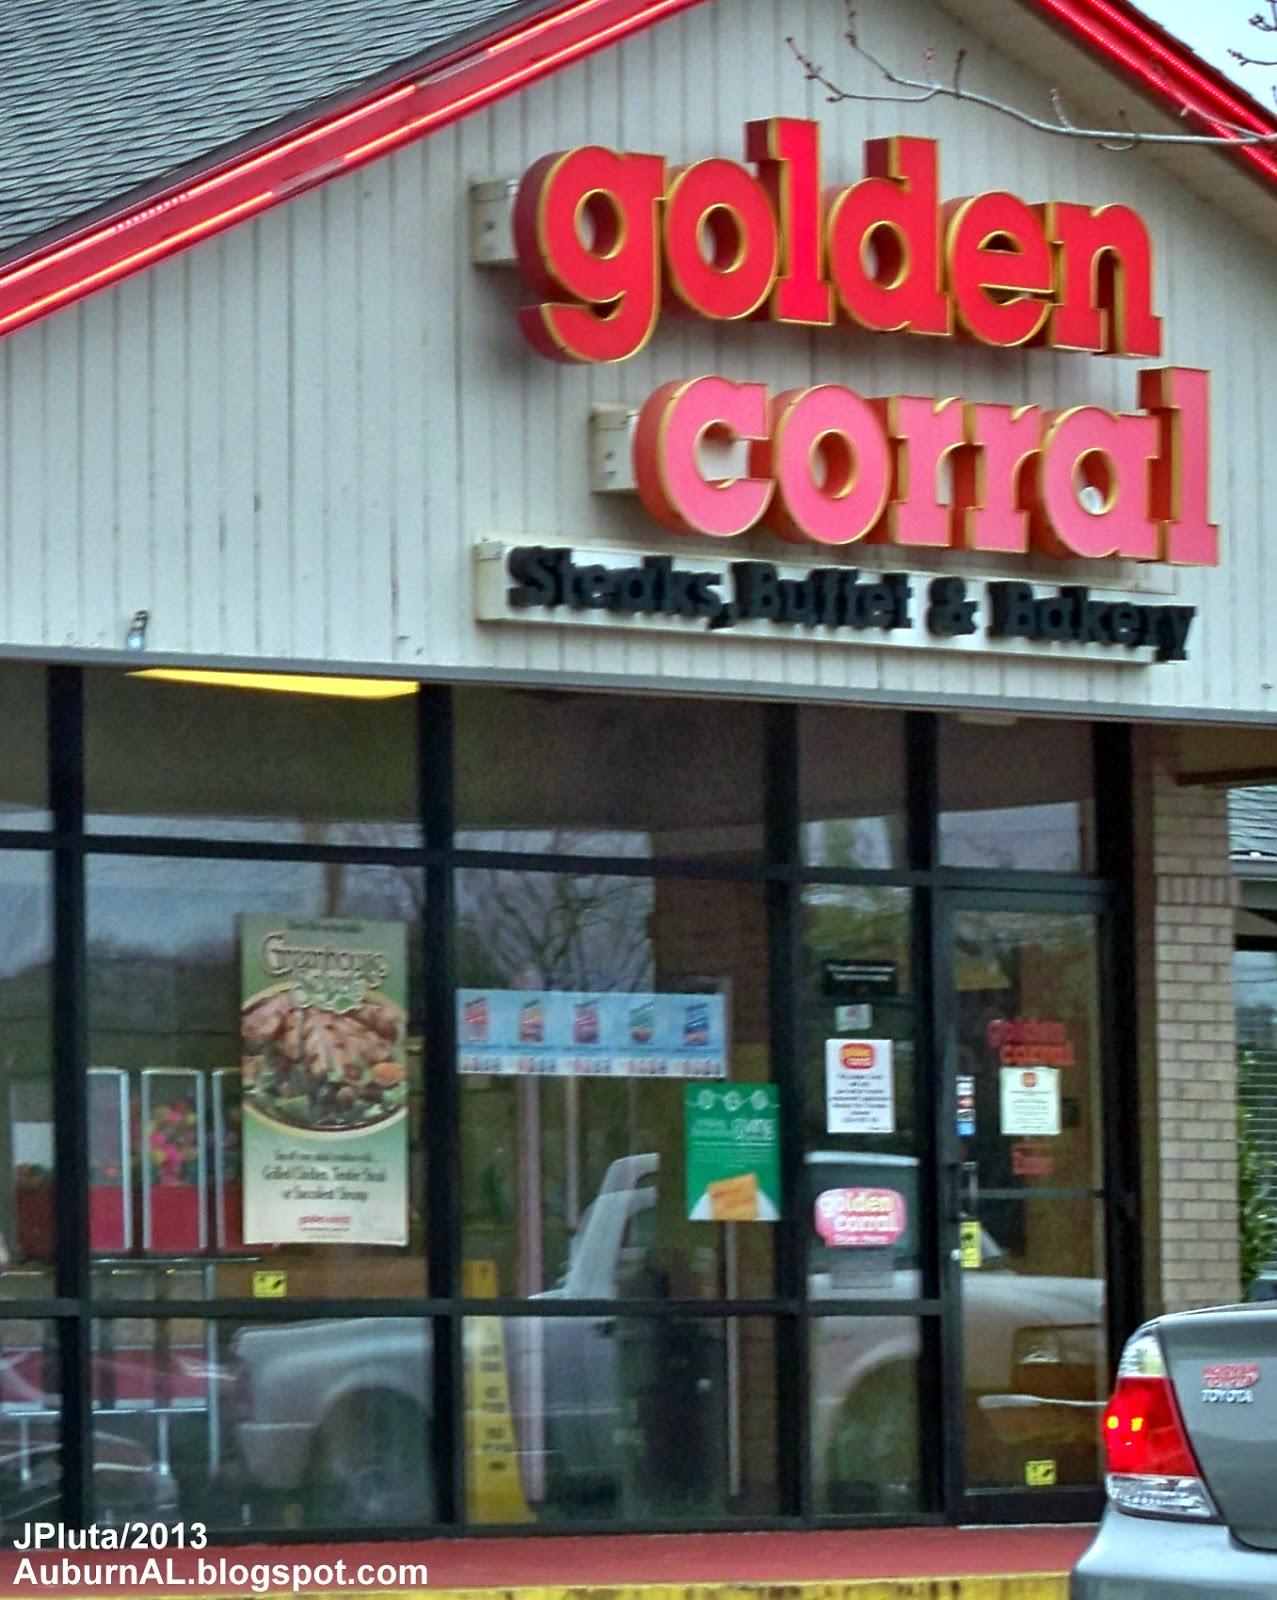 Alabama lee county salem - Golden Corral Opelika Alabama Birmingham Hwy Entrance Golden Corral Buffet Grill Restaurant Opelika Al Ayce Lee County Auburn